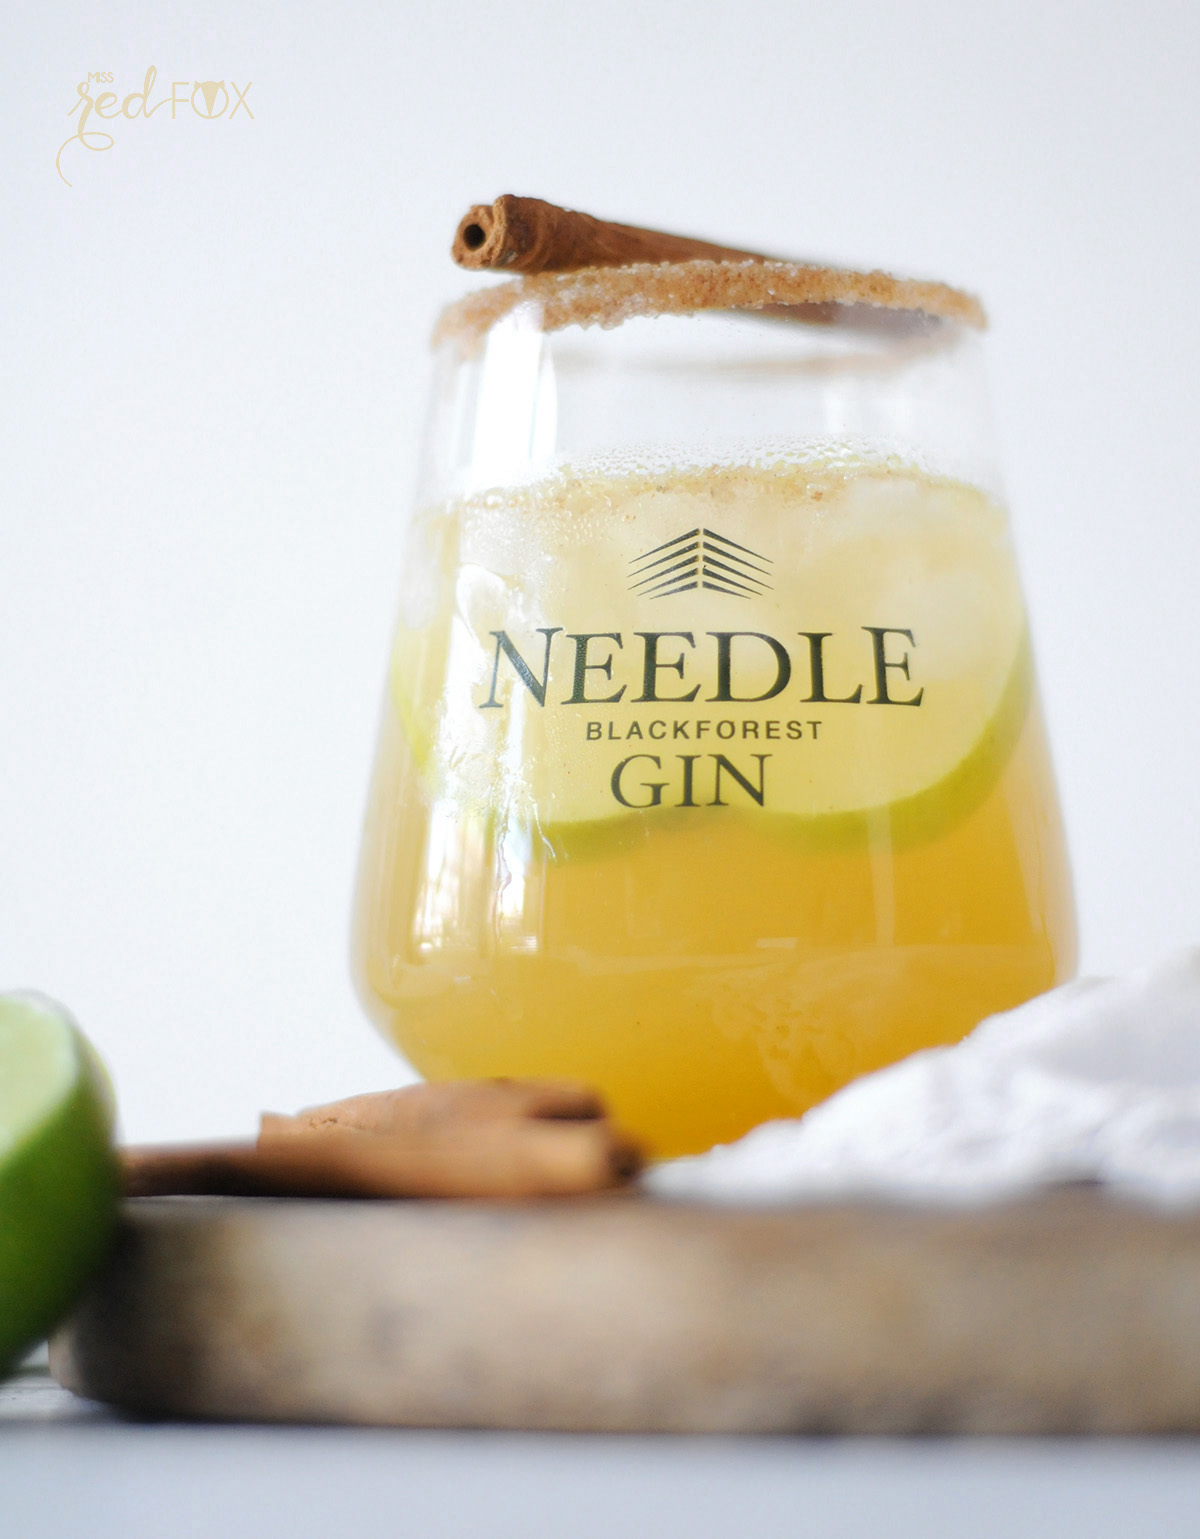 missredfox - Needle Gin - Cocktail mit Apfel Honig Zimt - 05